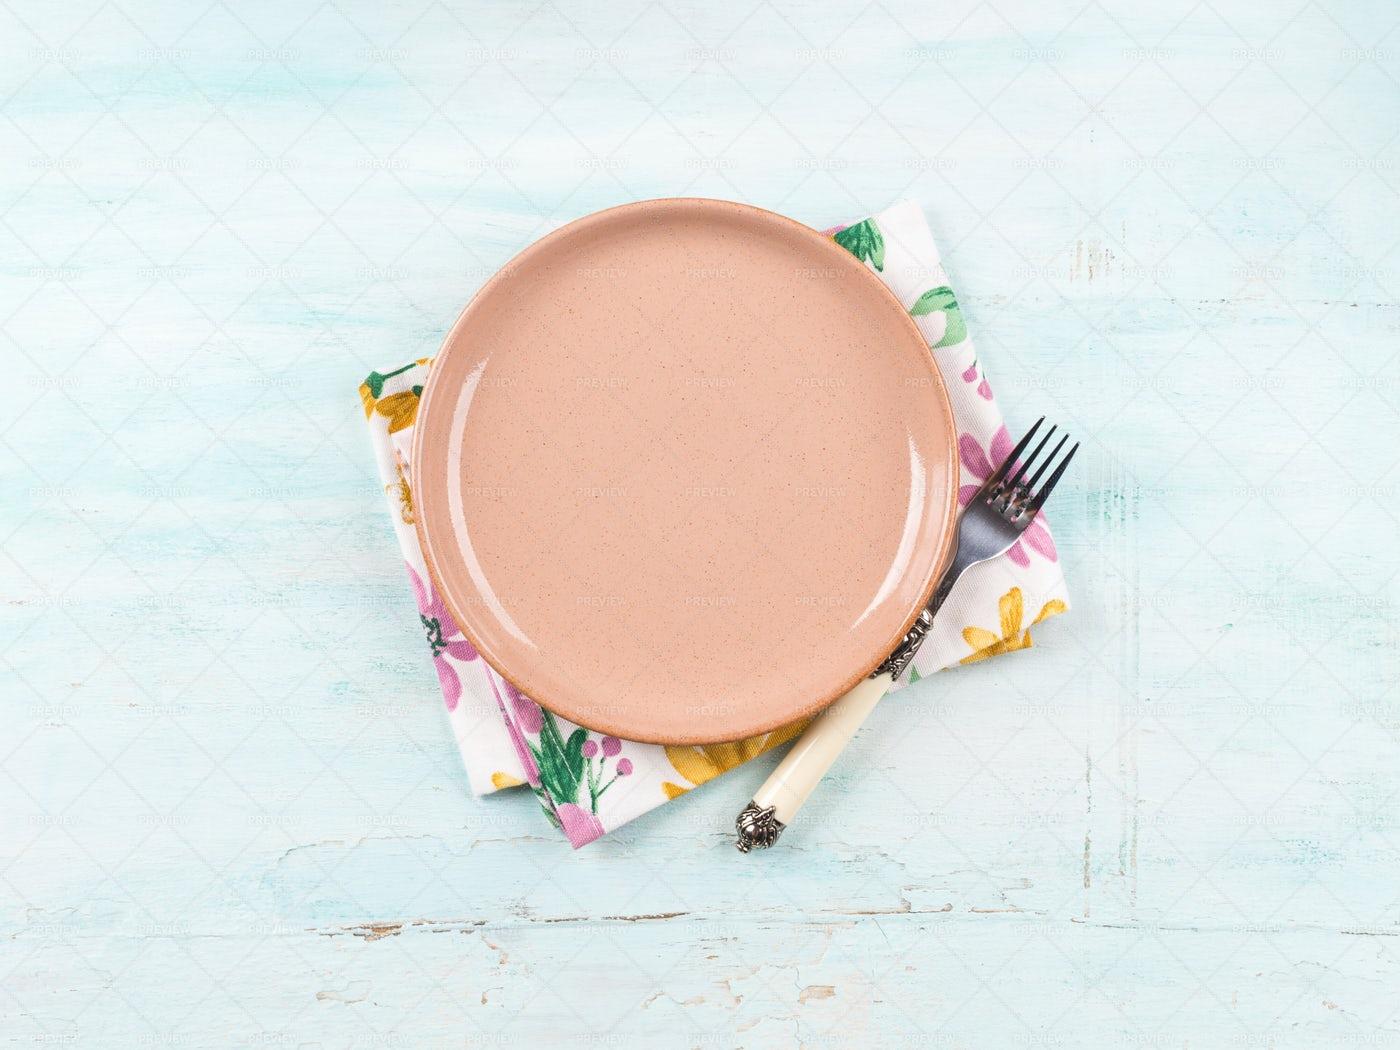 Pastel Table Setting: Stock Photos